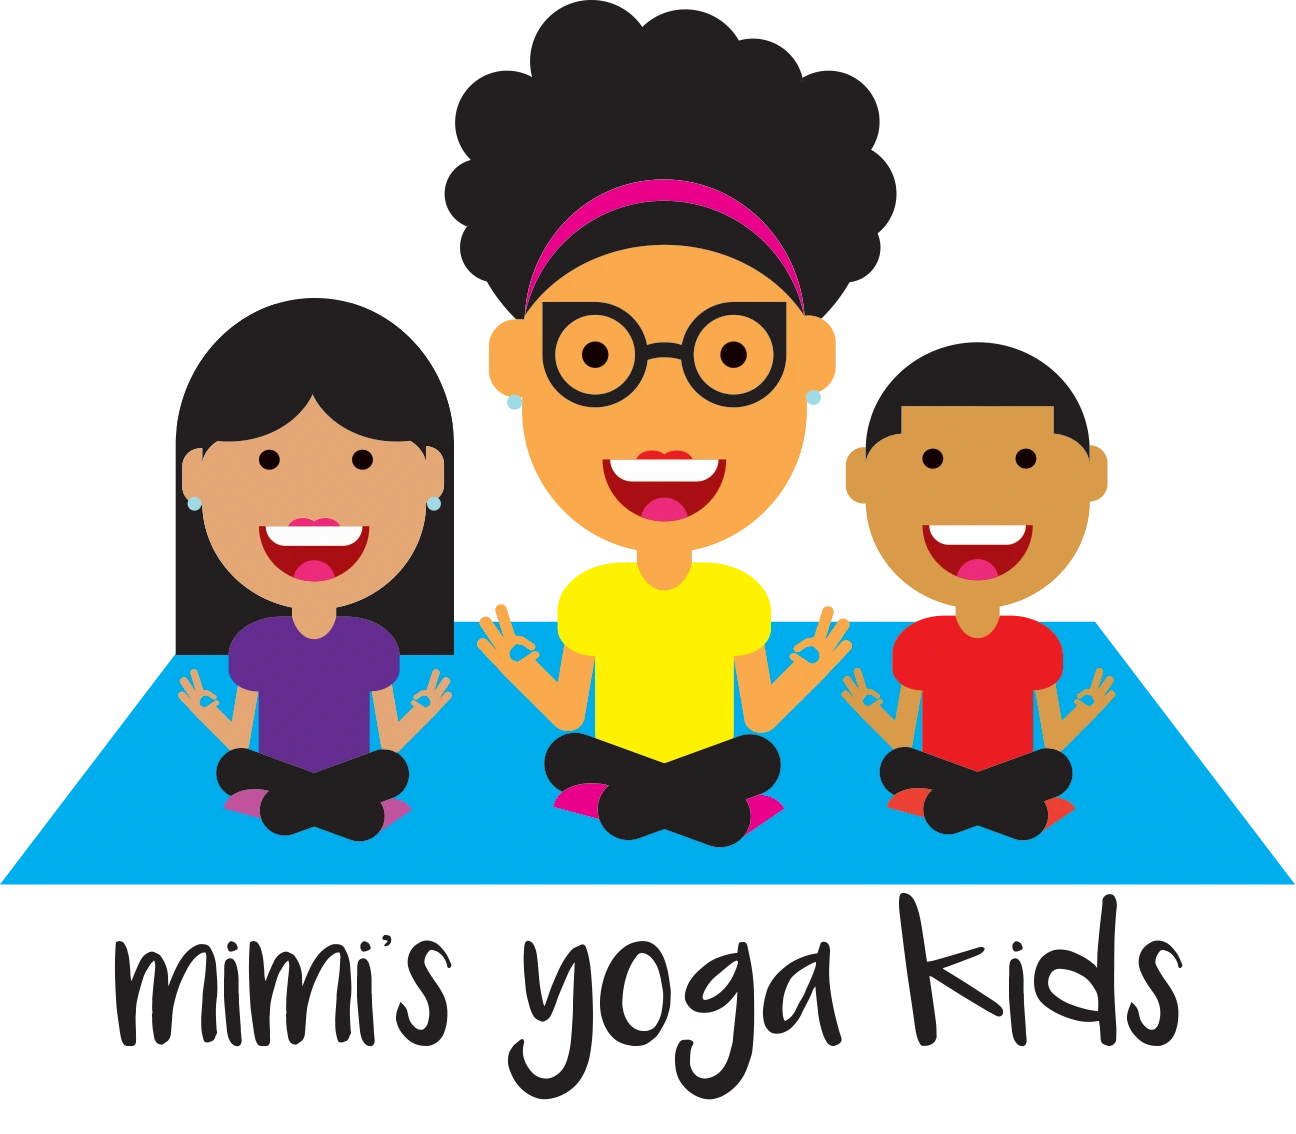 Mimi S Yoga Kids